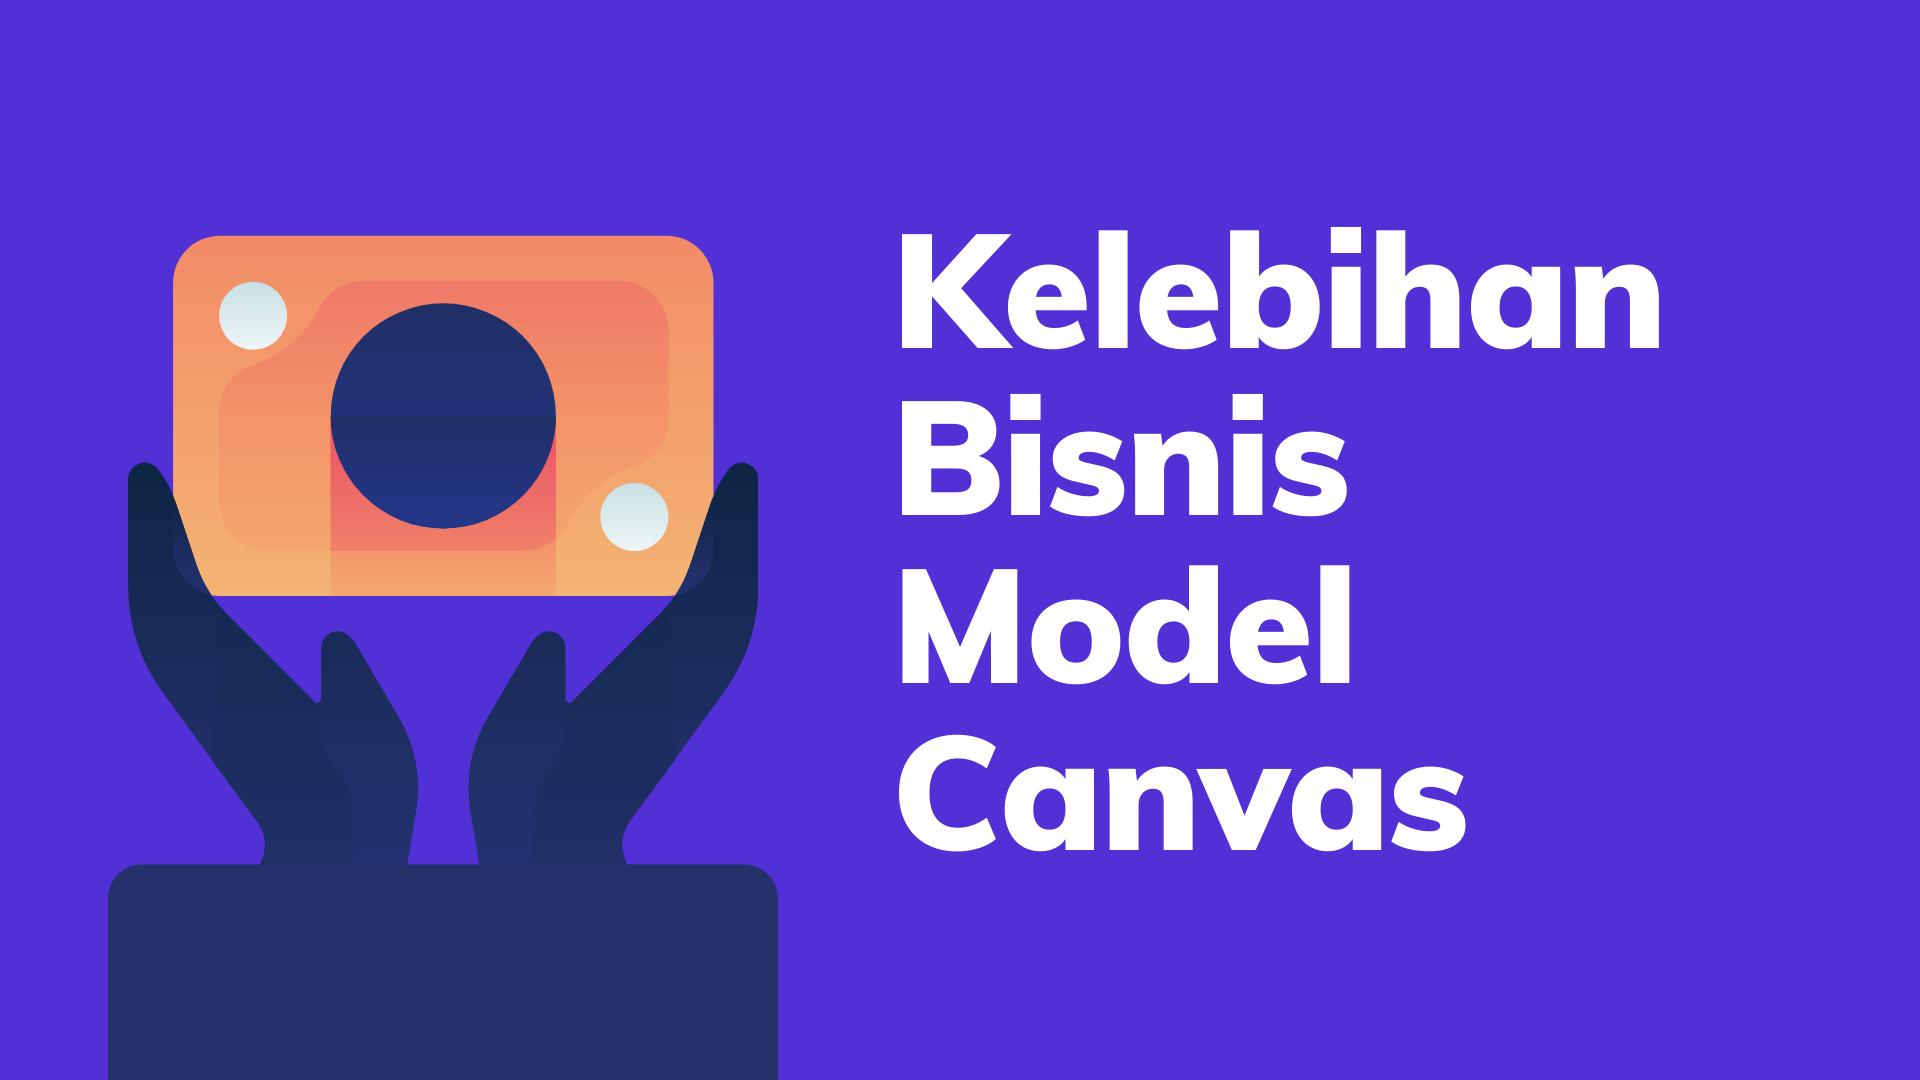 kelebihan bisnis model canvas